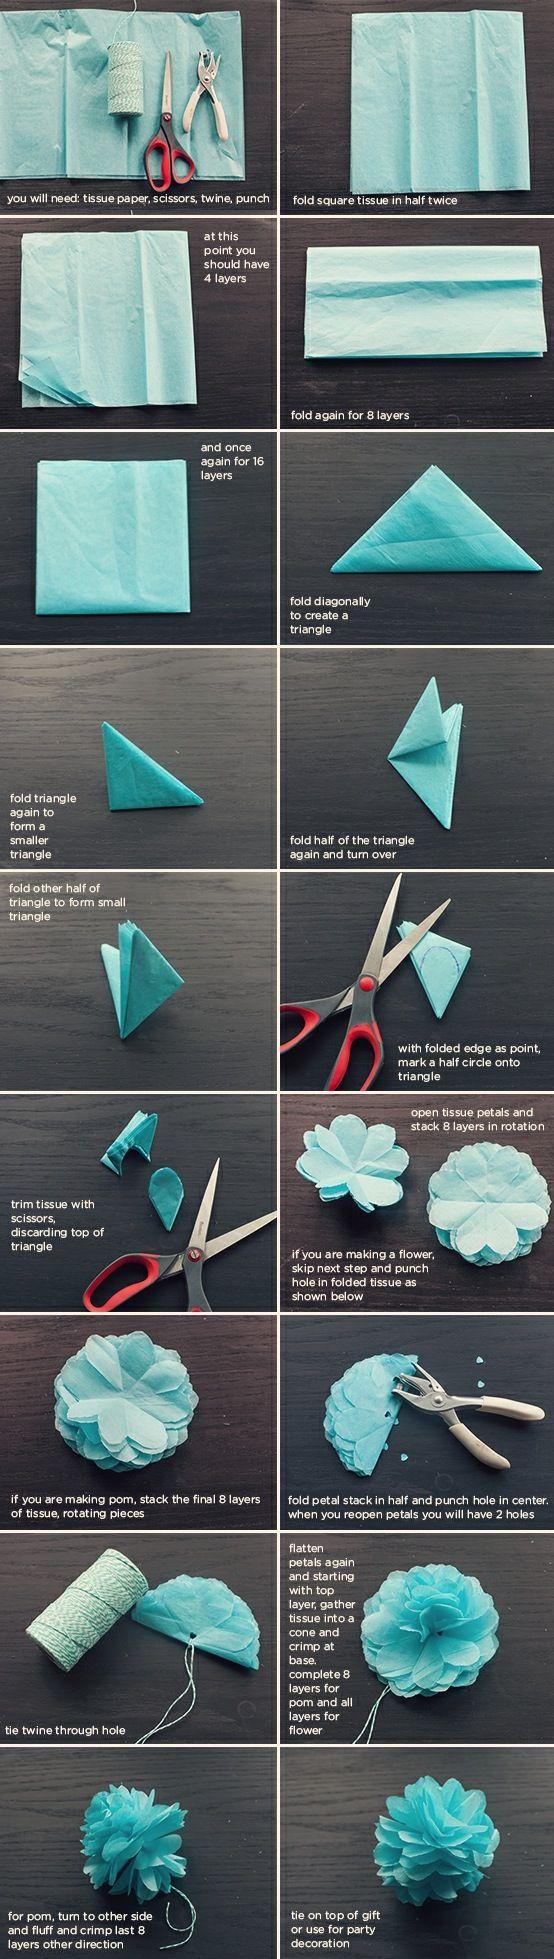 Tutorial Pompones de Papel | Daisy HandmadeDaisy Handmade